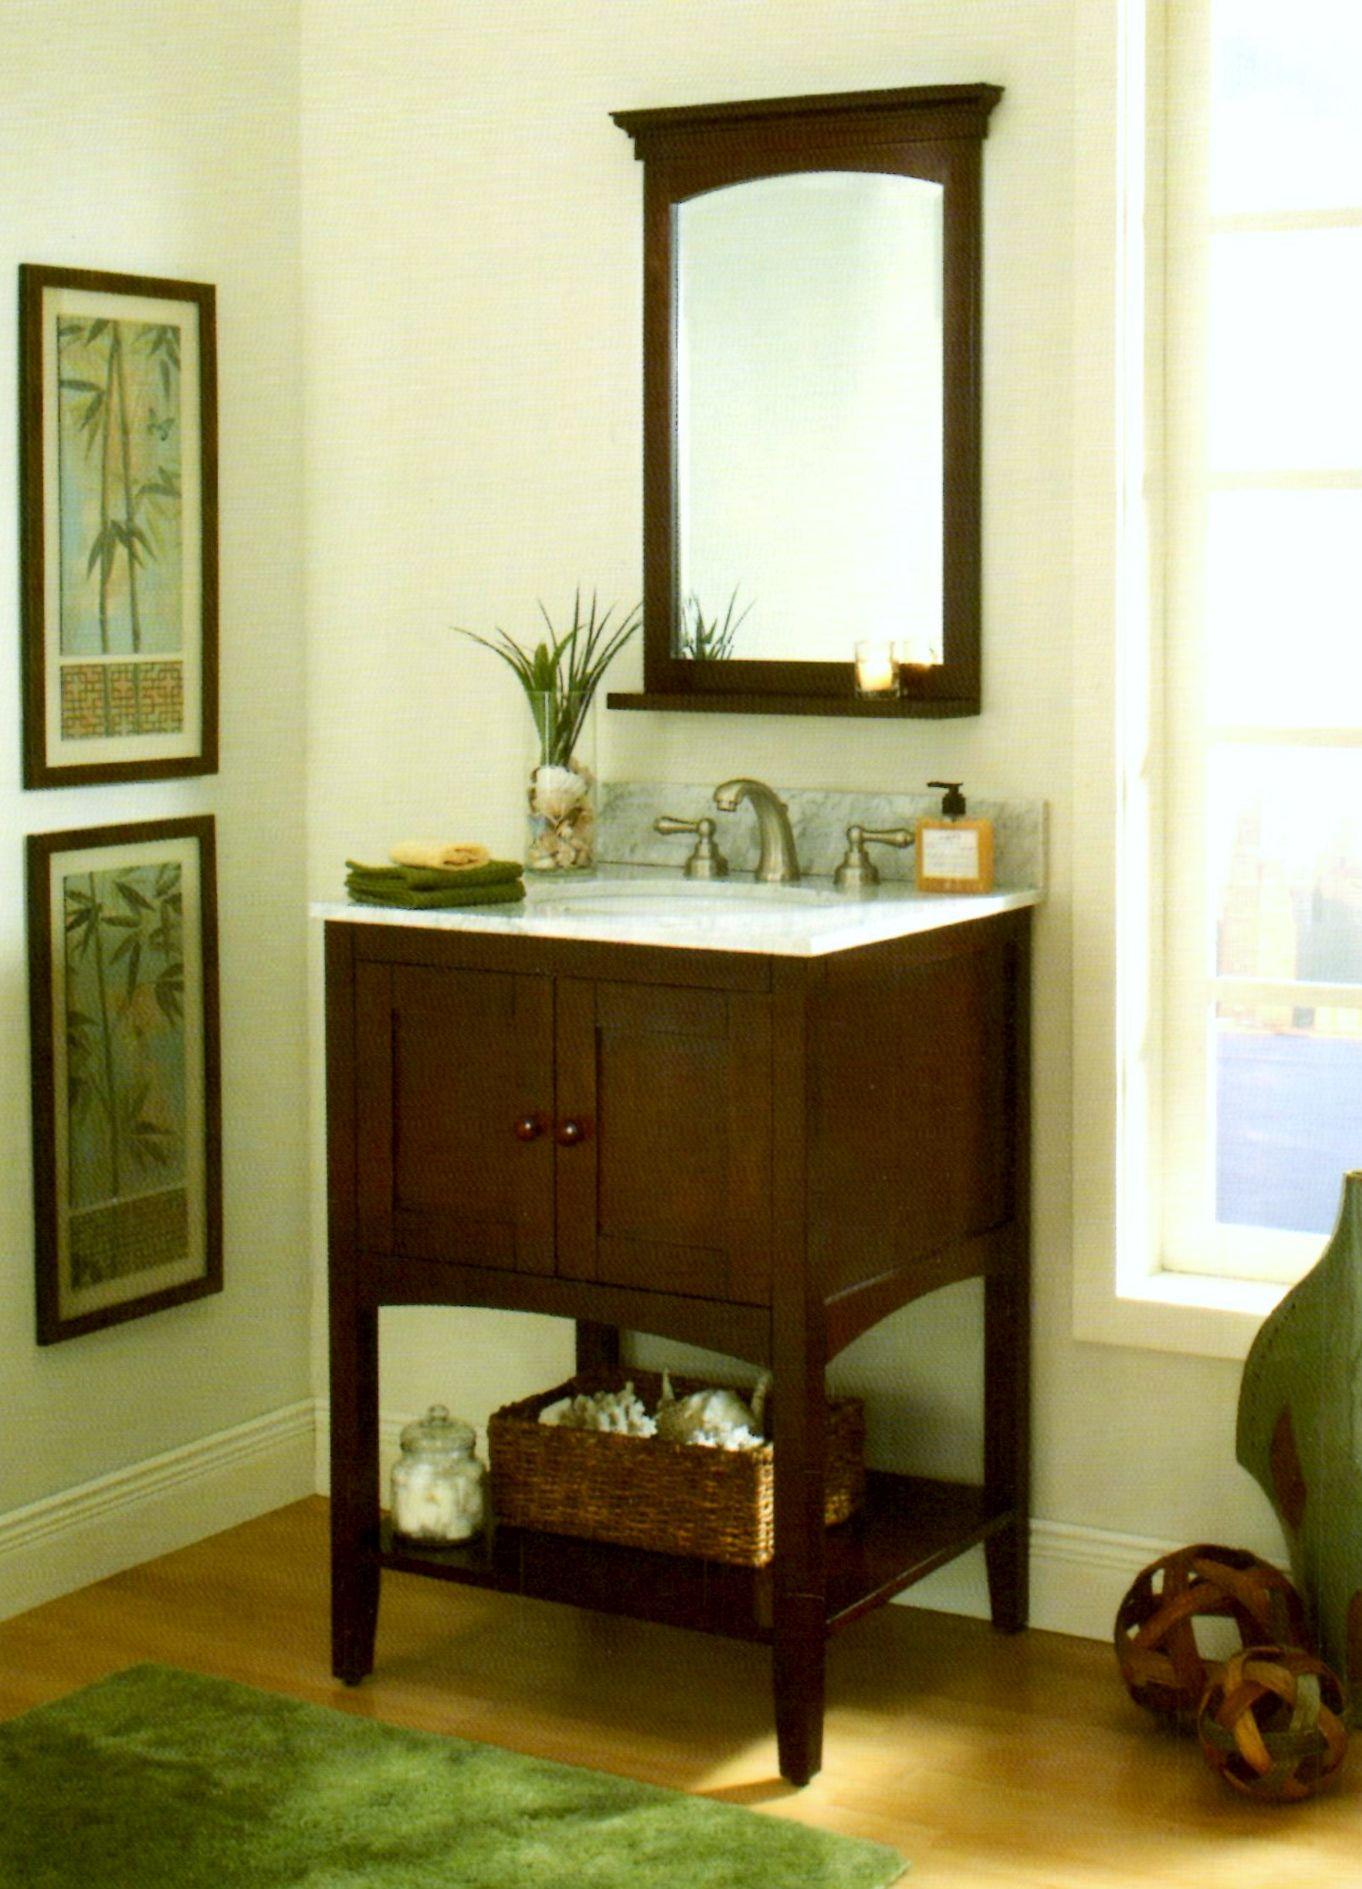 Inset Doors Adjule Leveler Arched Side Ferendo Kitchen Bath Vanity Rhode Island